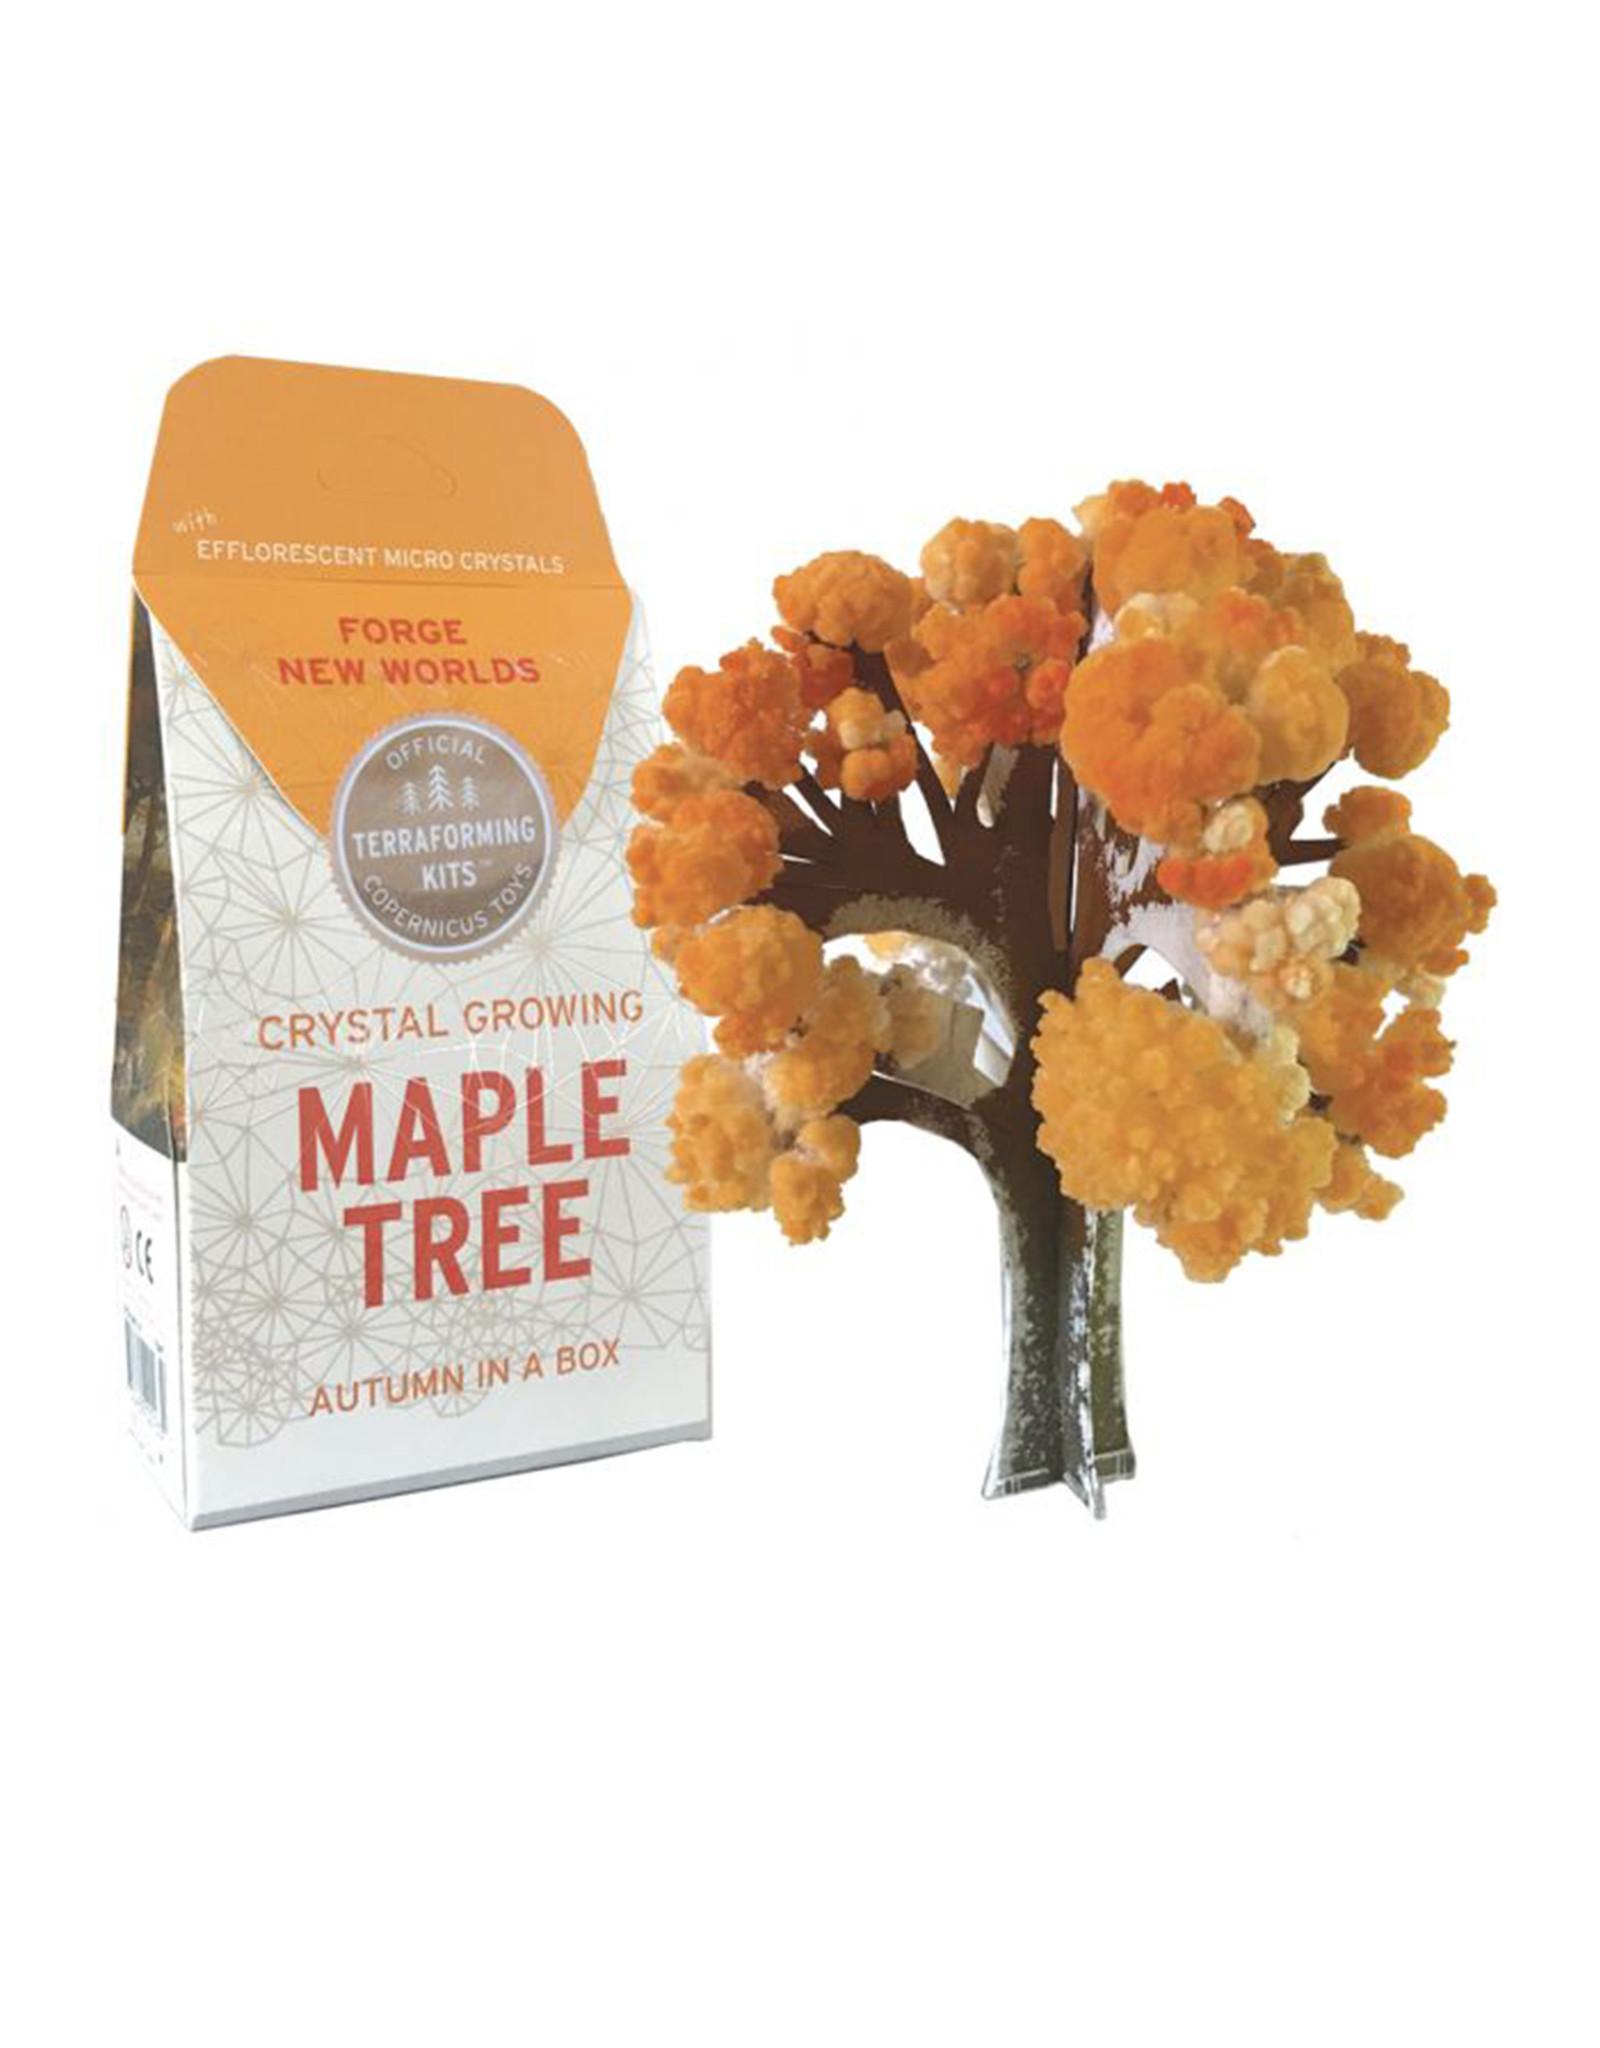 Crystal Growing: Maple Tree